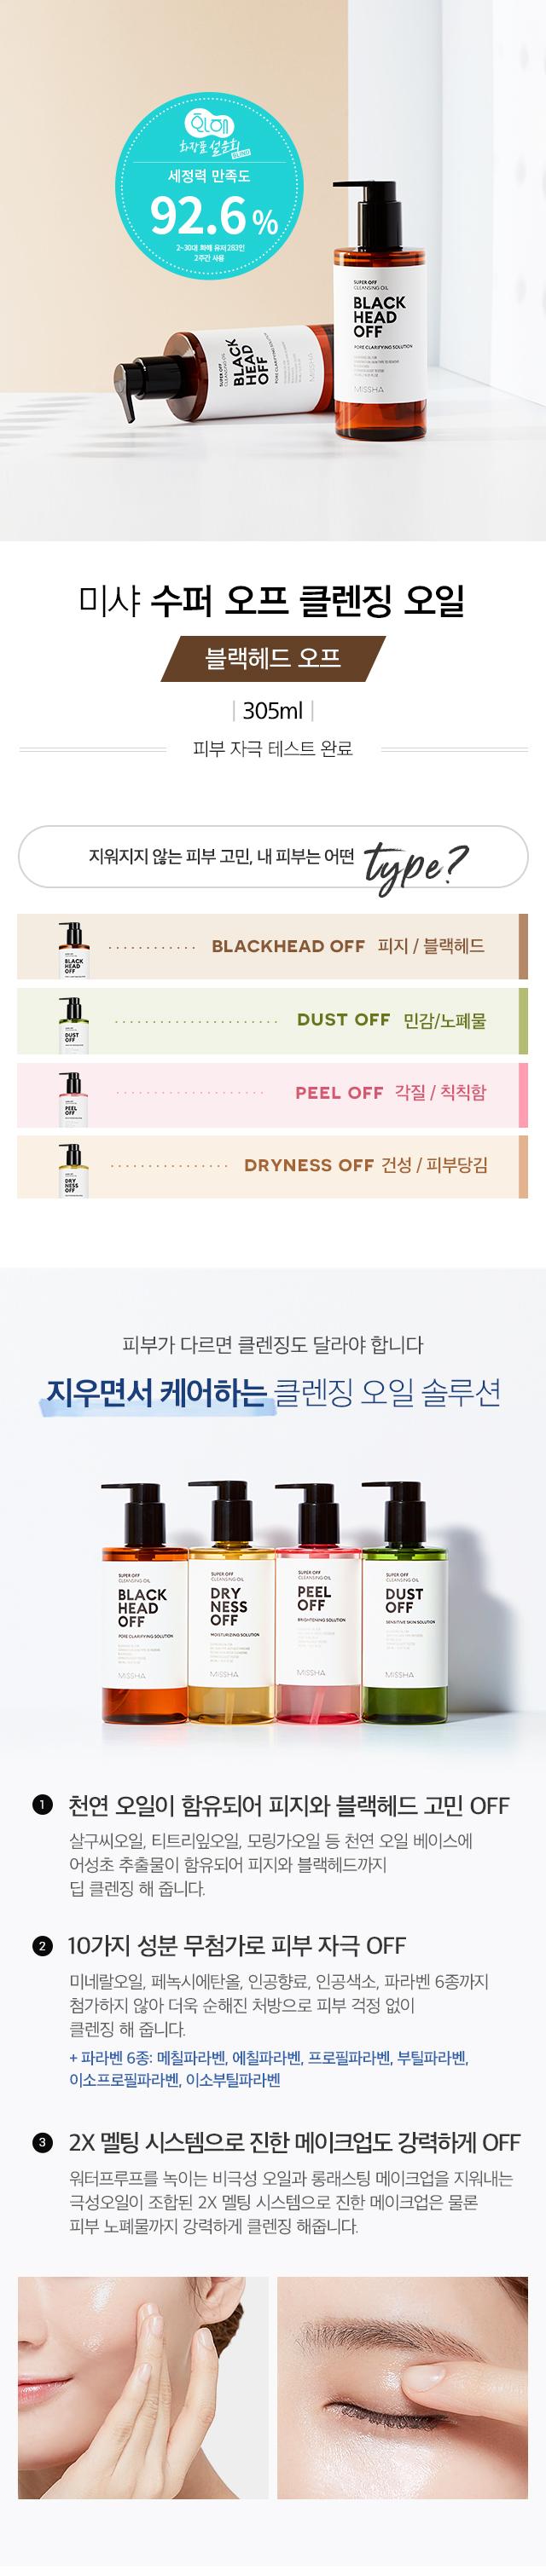 Combo 10 Gói mini Dầu Tẩy Trang MISSHA Super Off Cleansing Oil